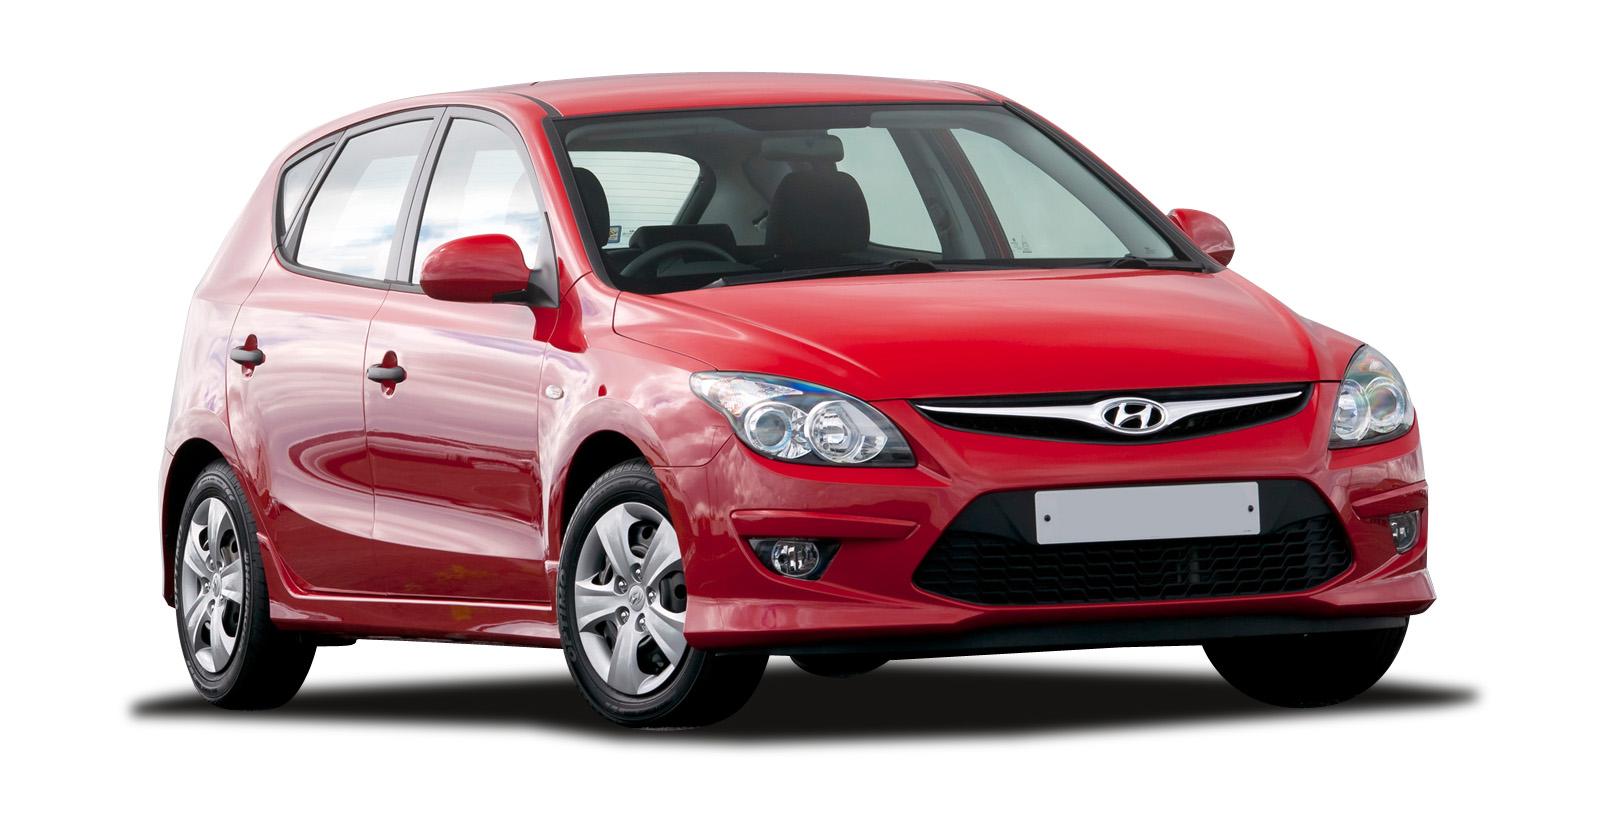 Hyundai i30 I 2007 - 2010 Hatchback 5 door #7